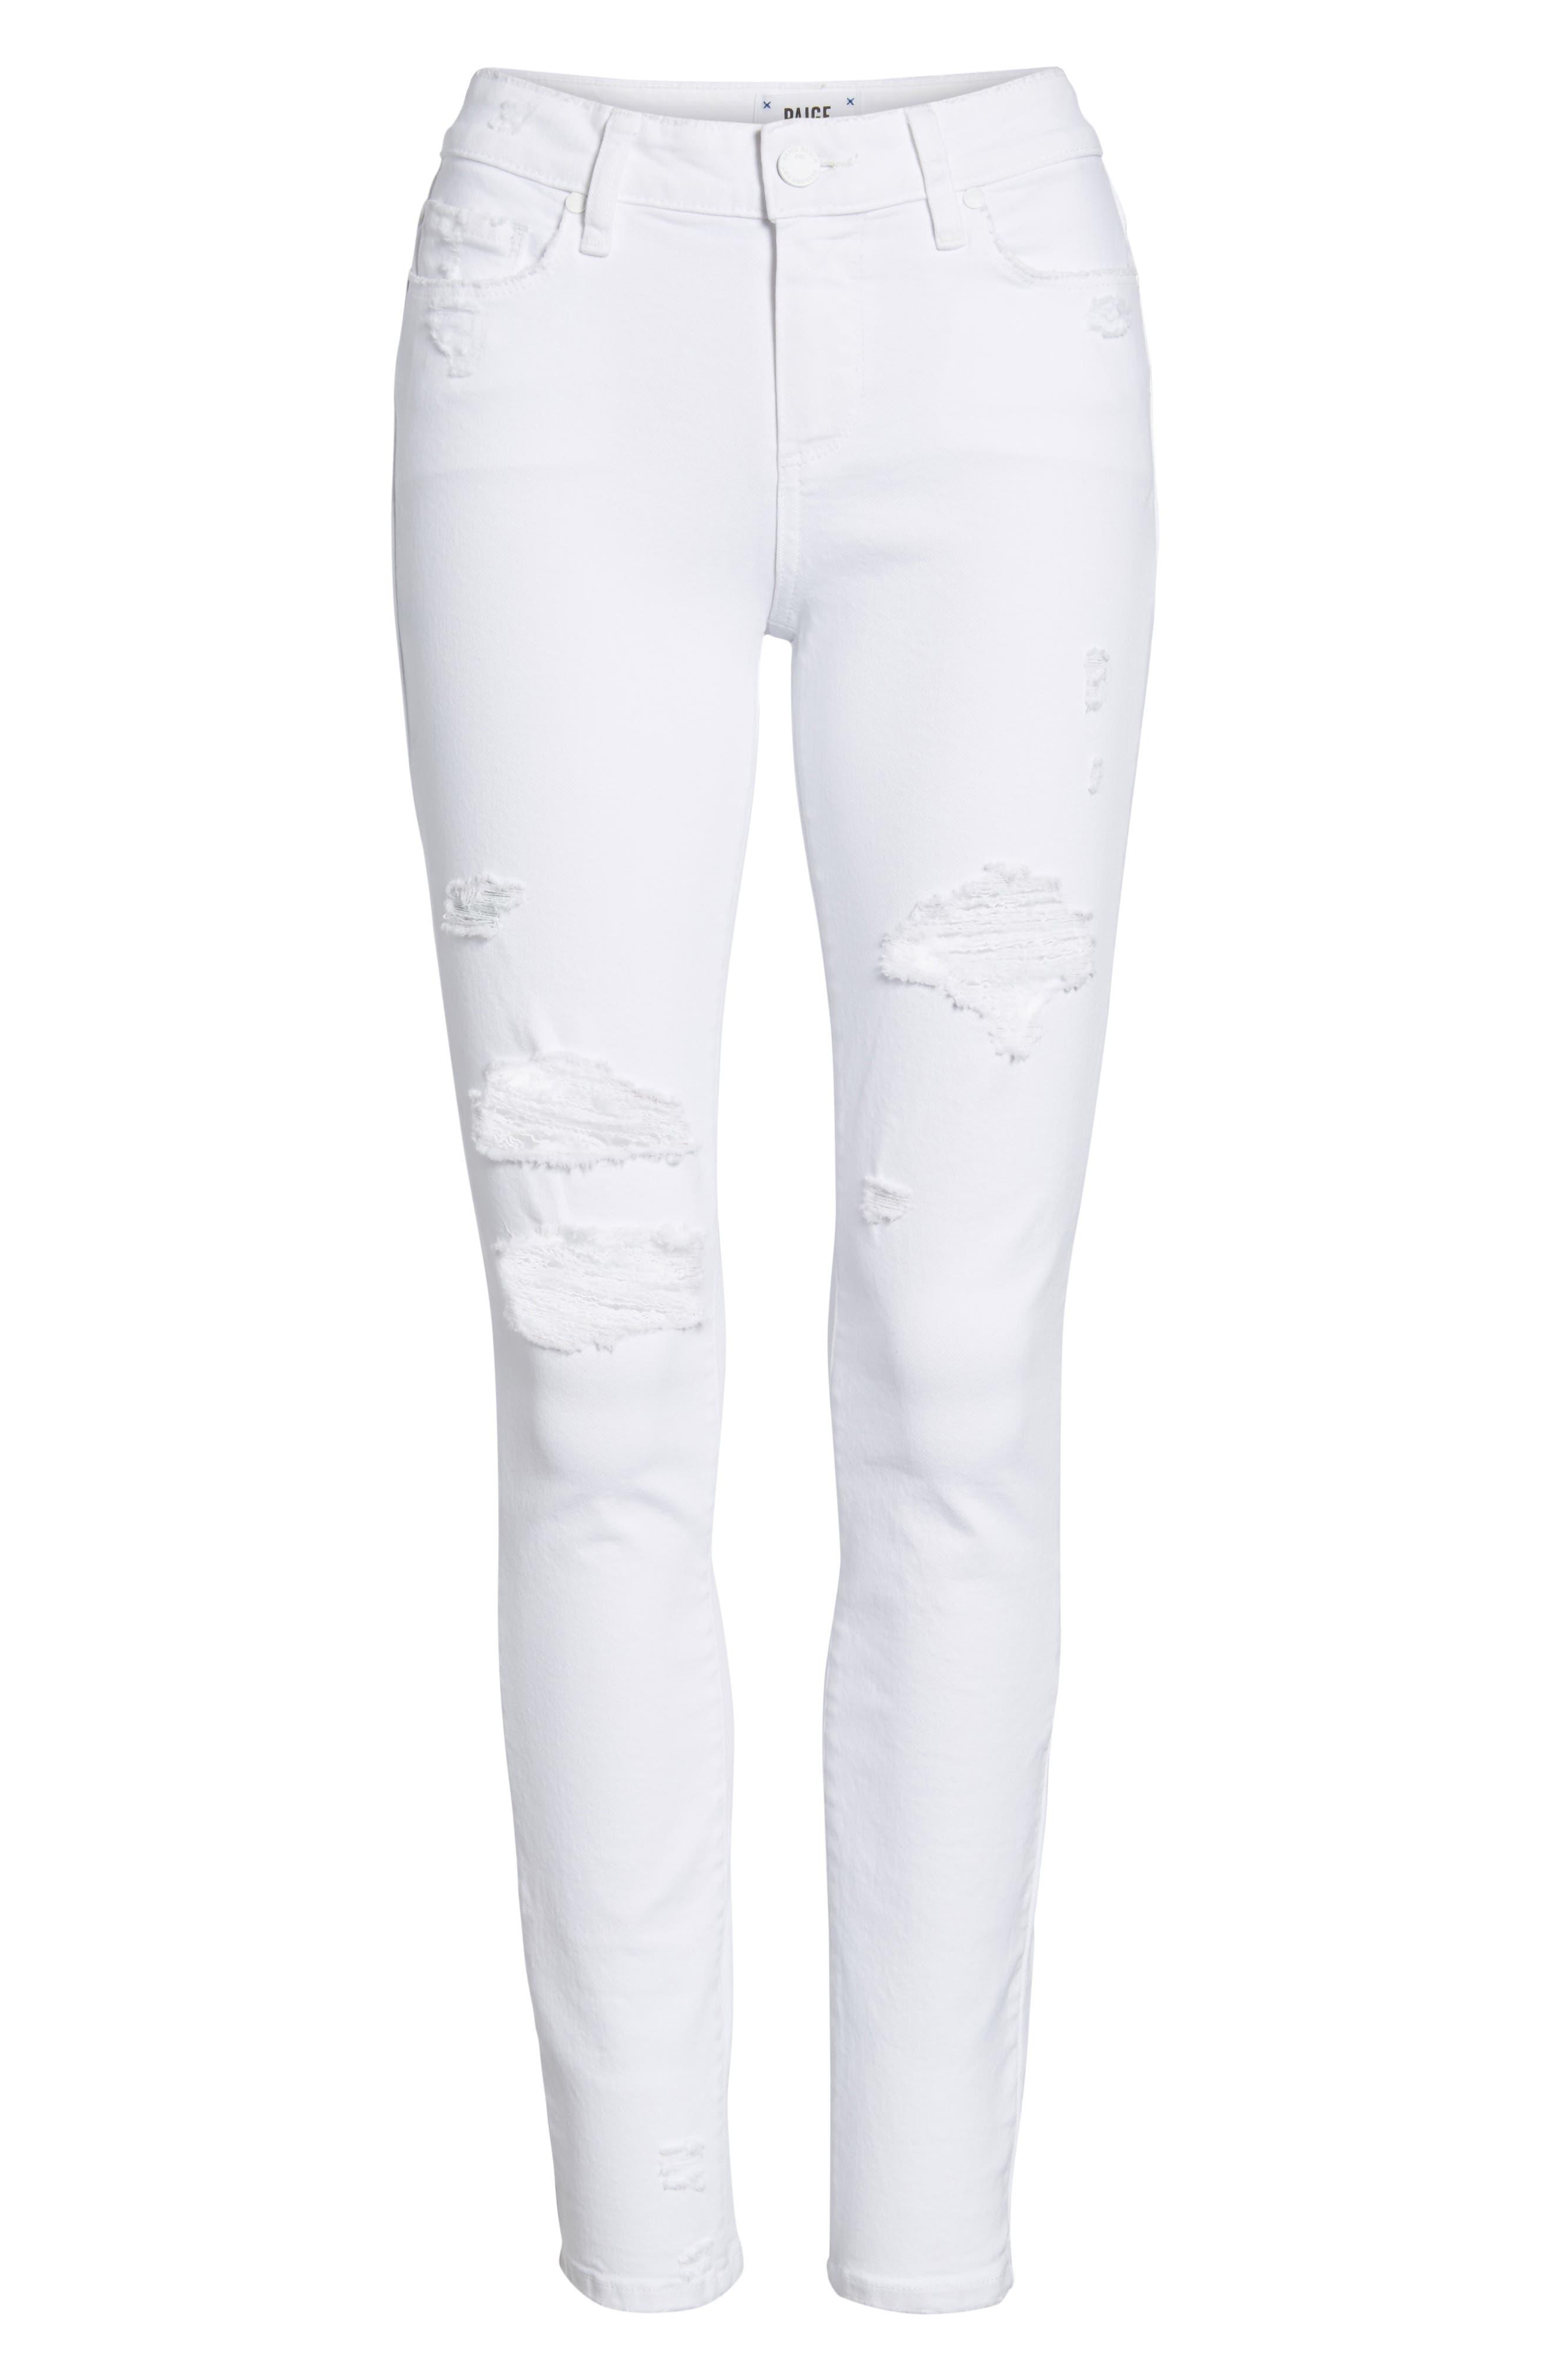 Verdugo Ripped Ultra Skinny Jeans,                             Alternate thumbnail 7, color,                             100